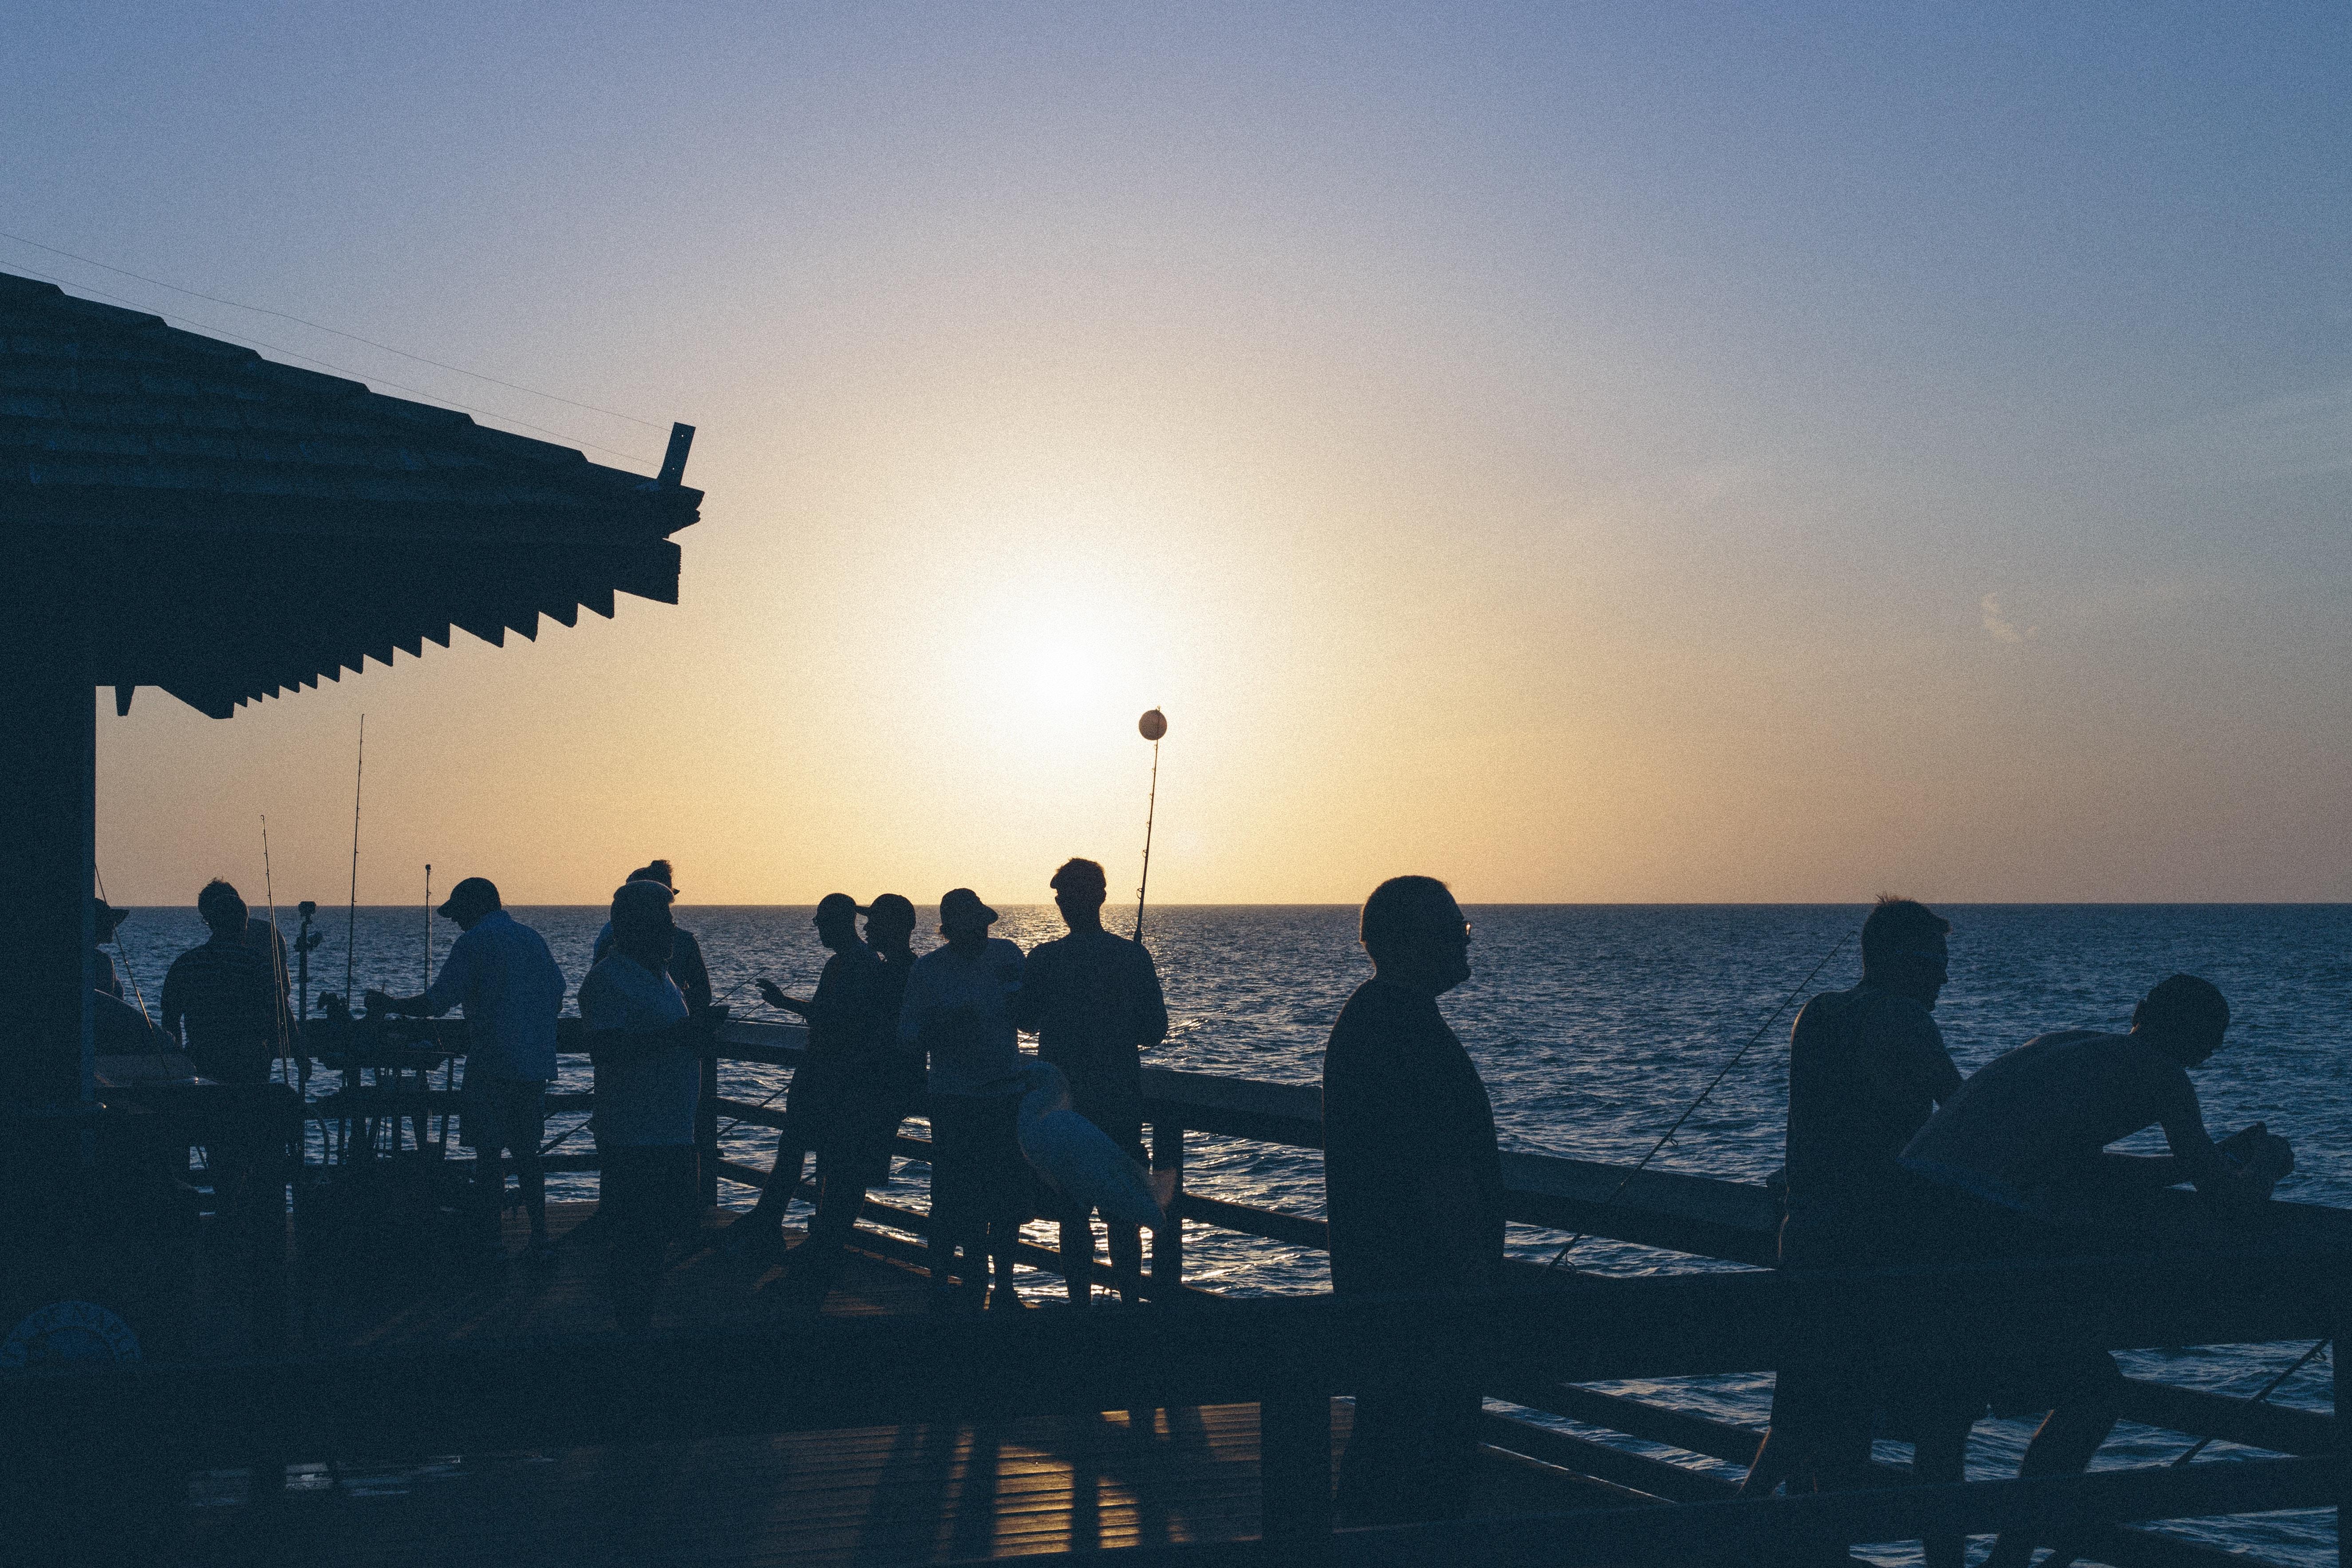 Gulf State Park Fishing Pier